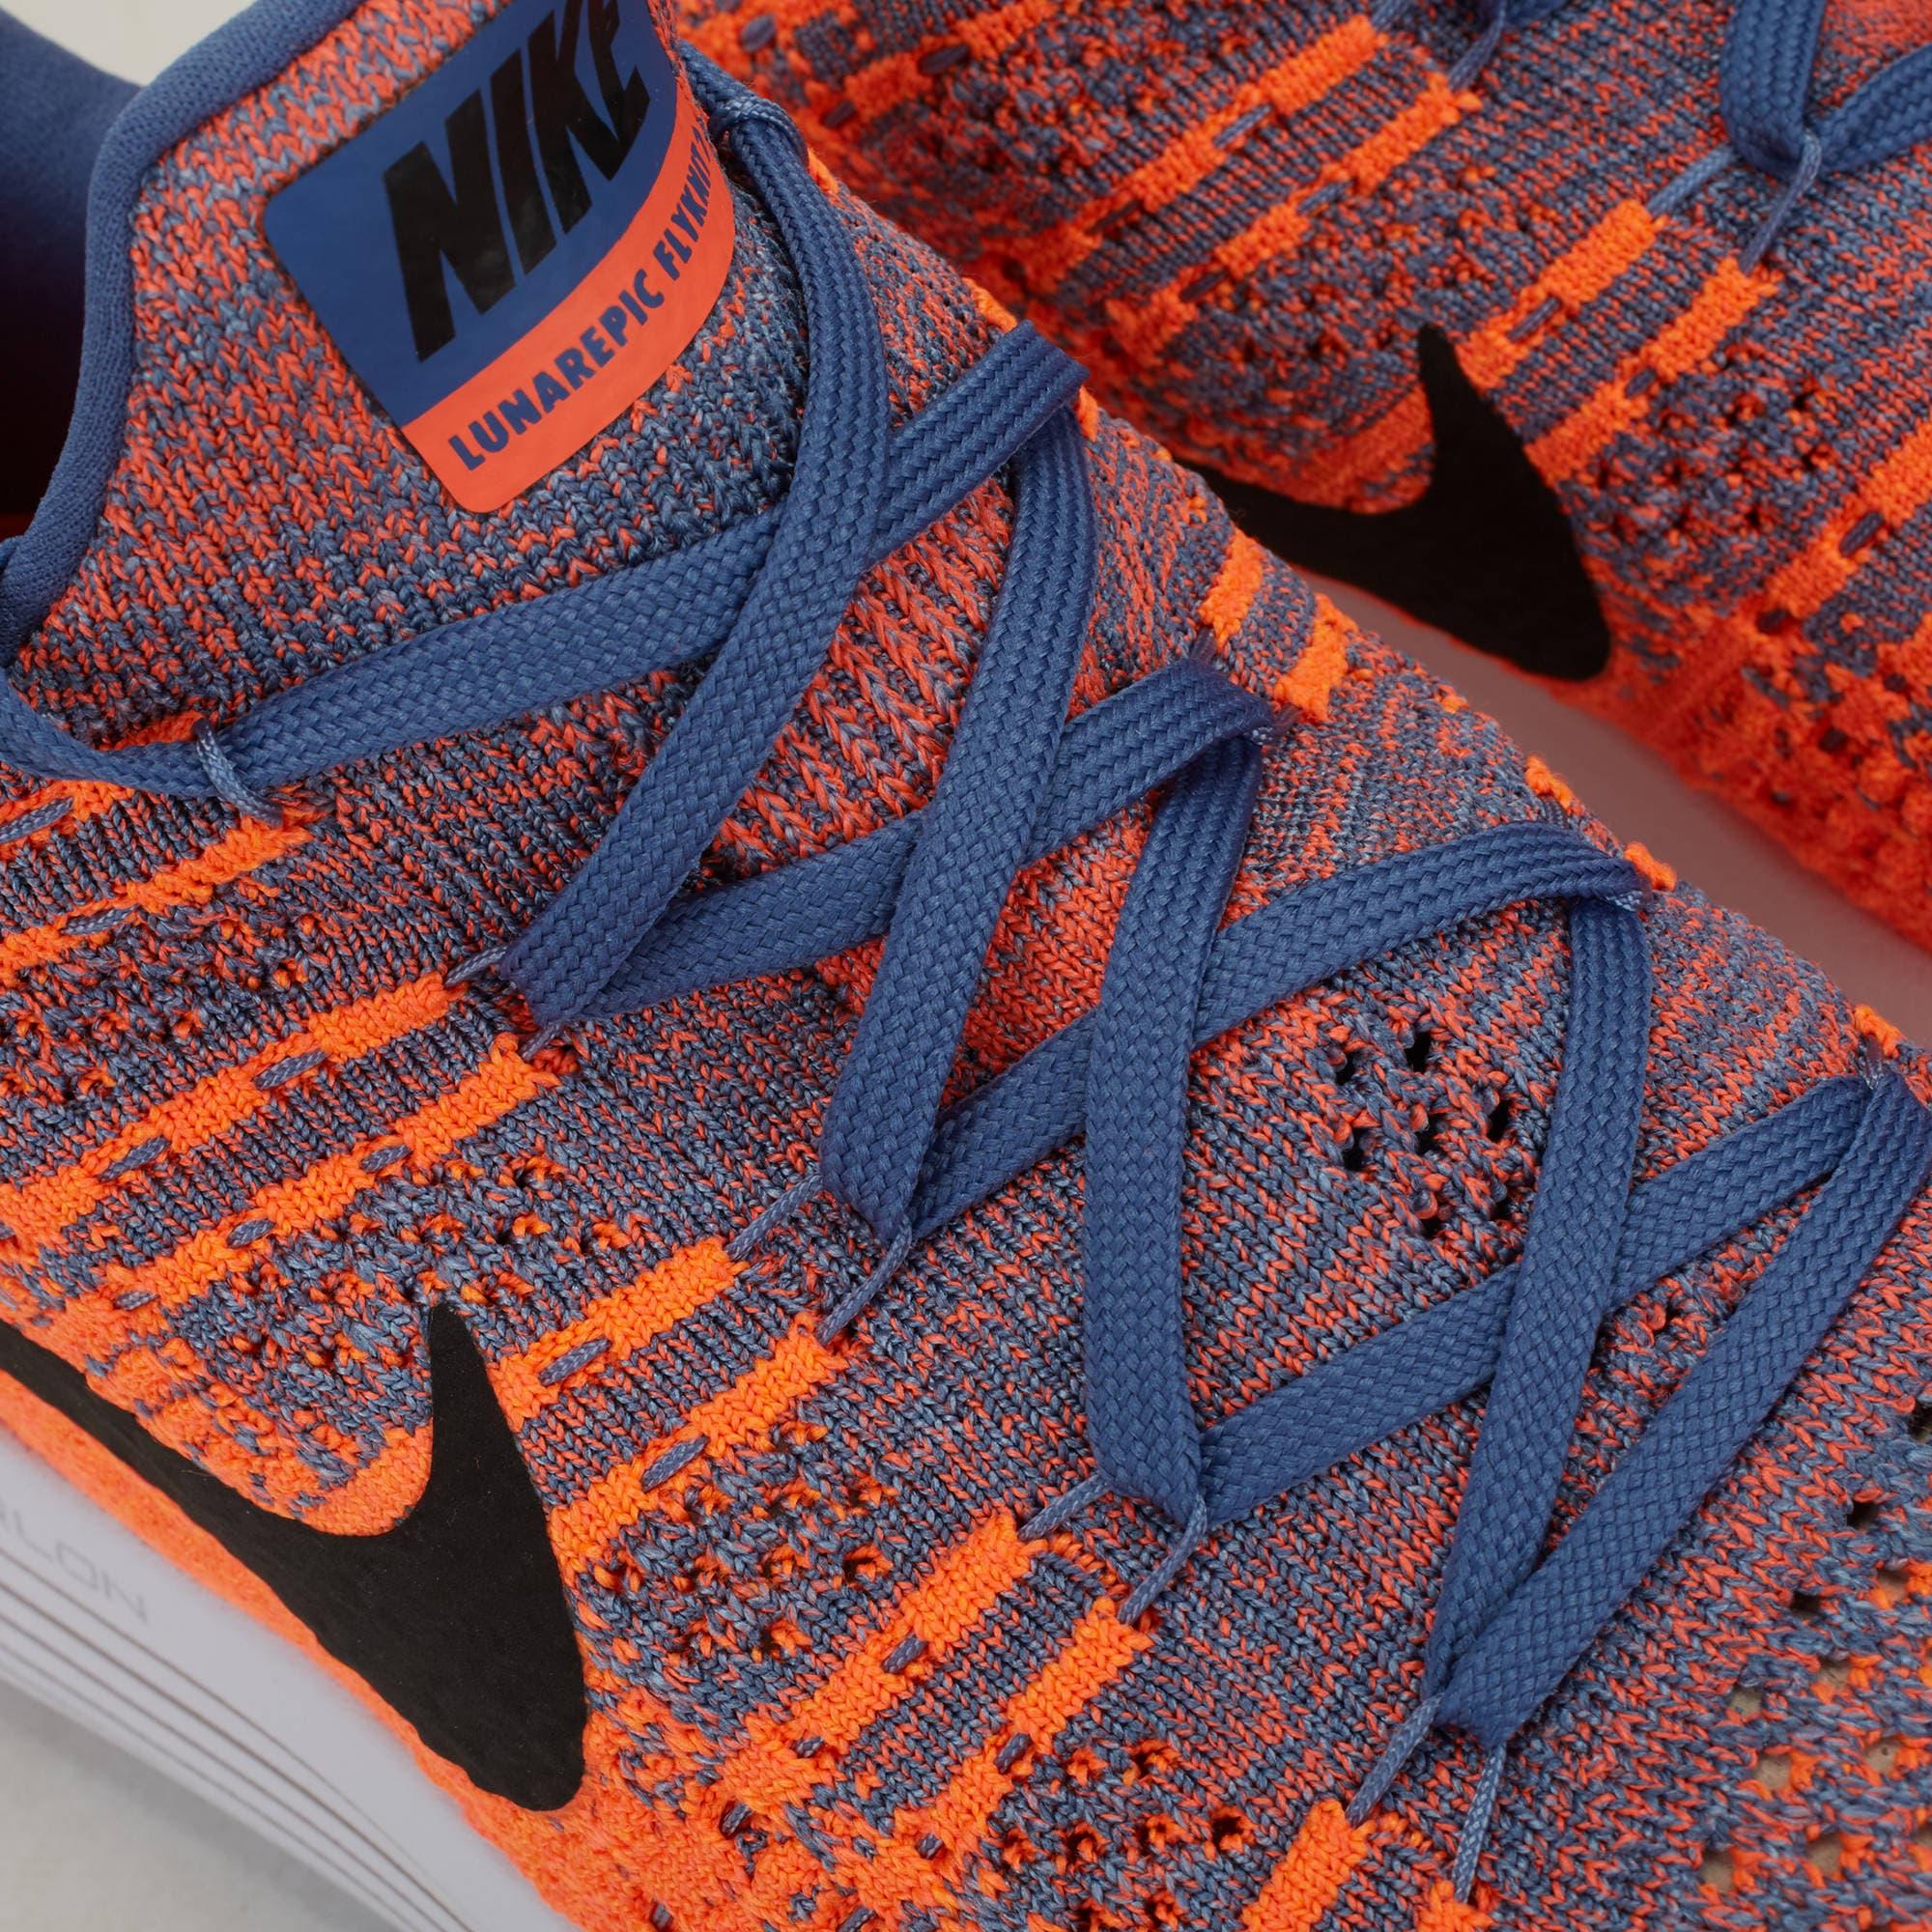 ... Nike Lunarepic Low Flyknit 2 Paramount Blue Black Max Orange -  Blanja.com 205ac8657a